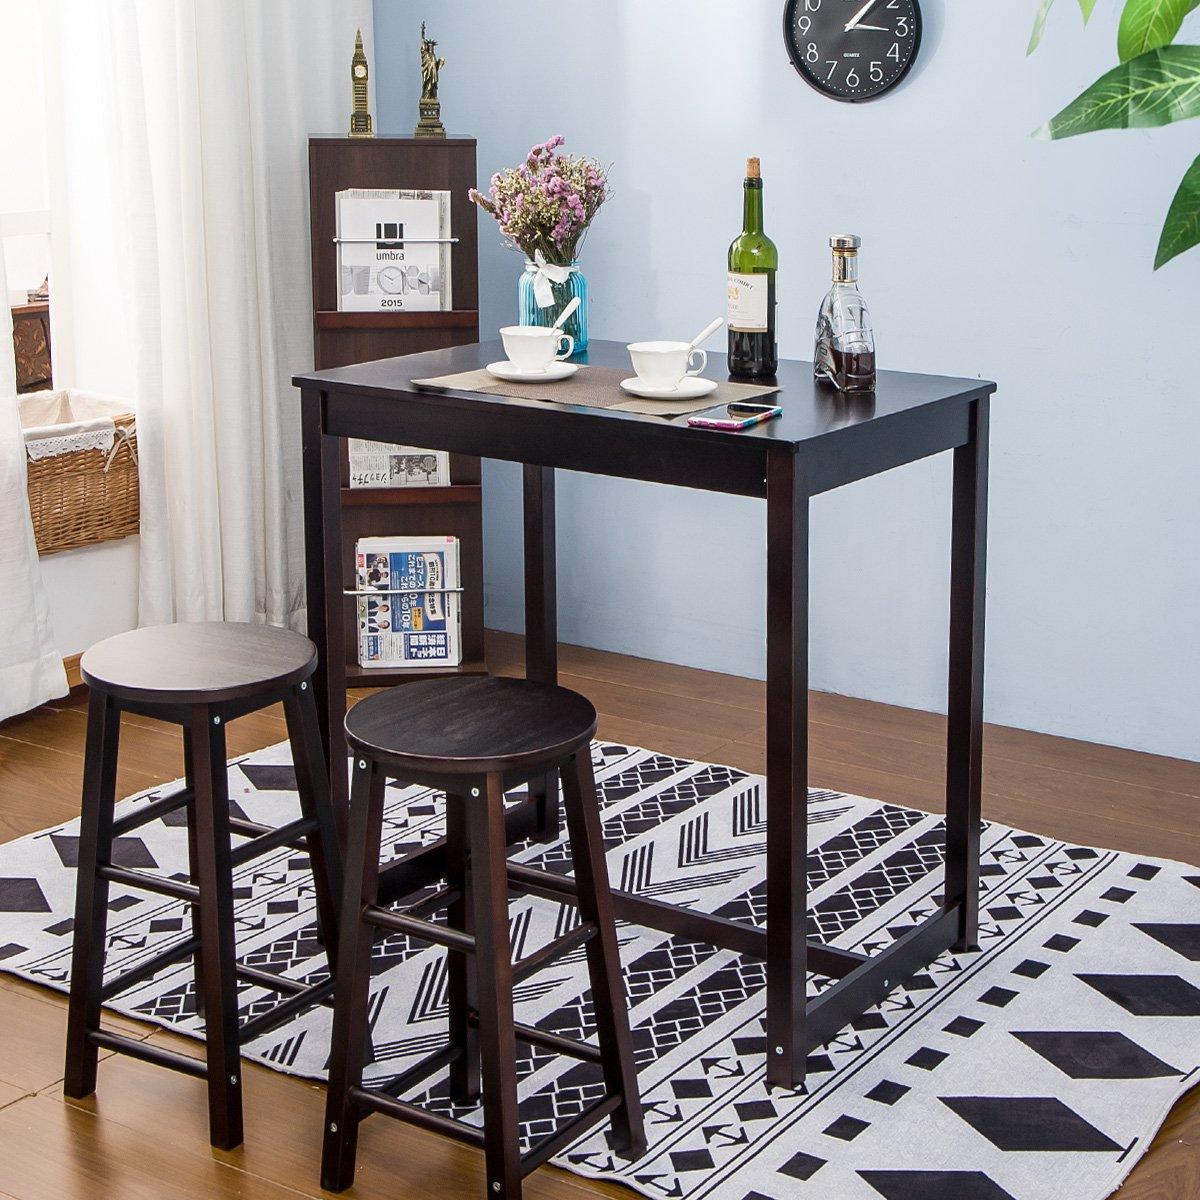 Merax 3-piece Dining Table Set High/Pub Table Set with 2 Bar Stools (3-piece Espresso)